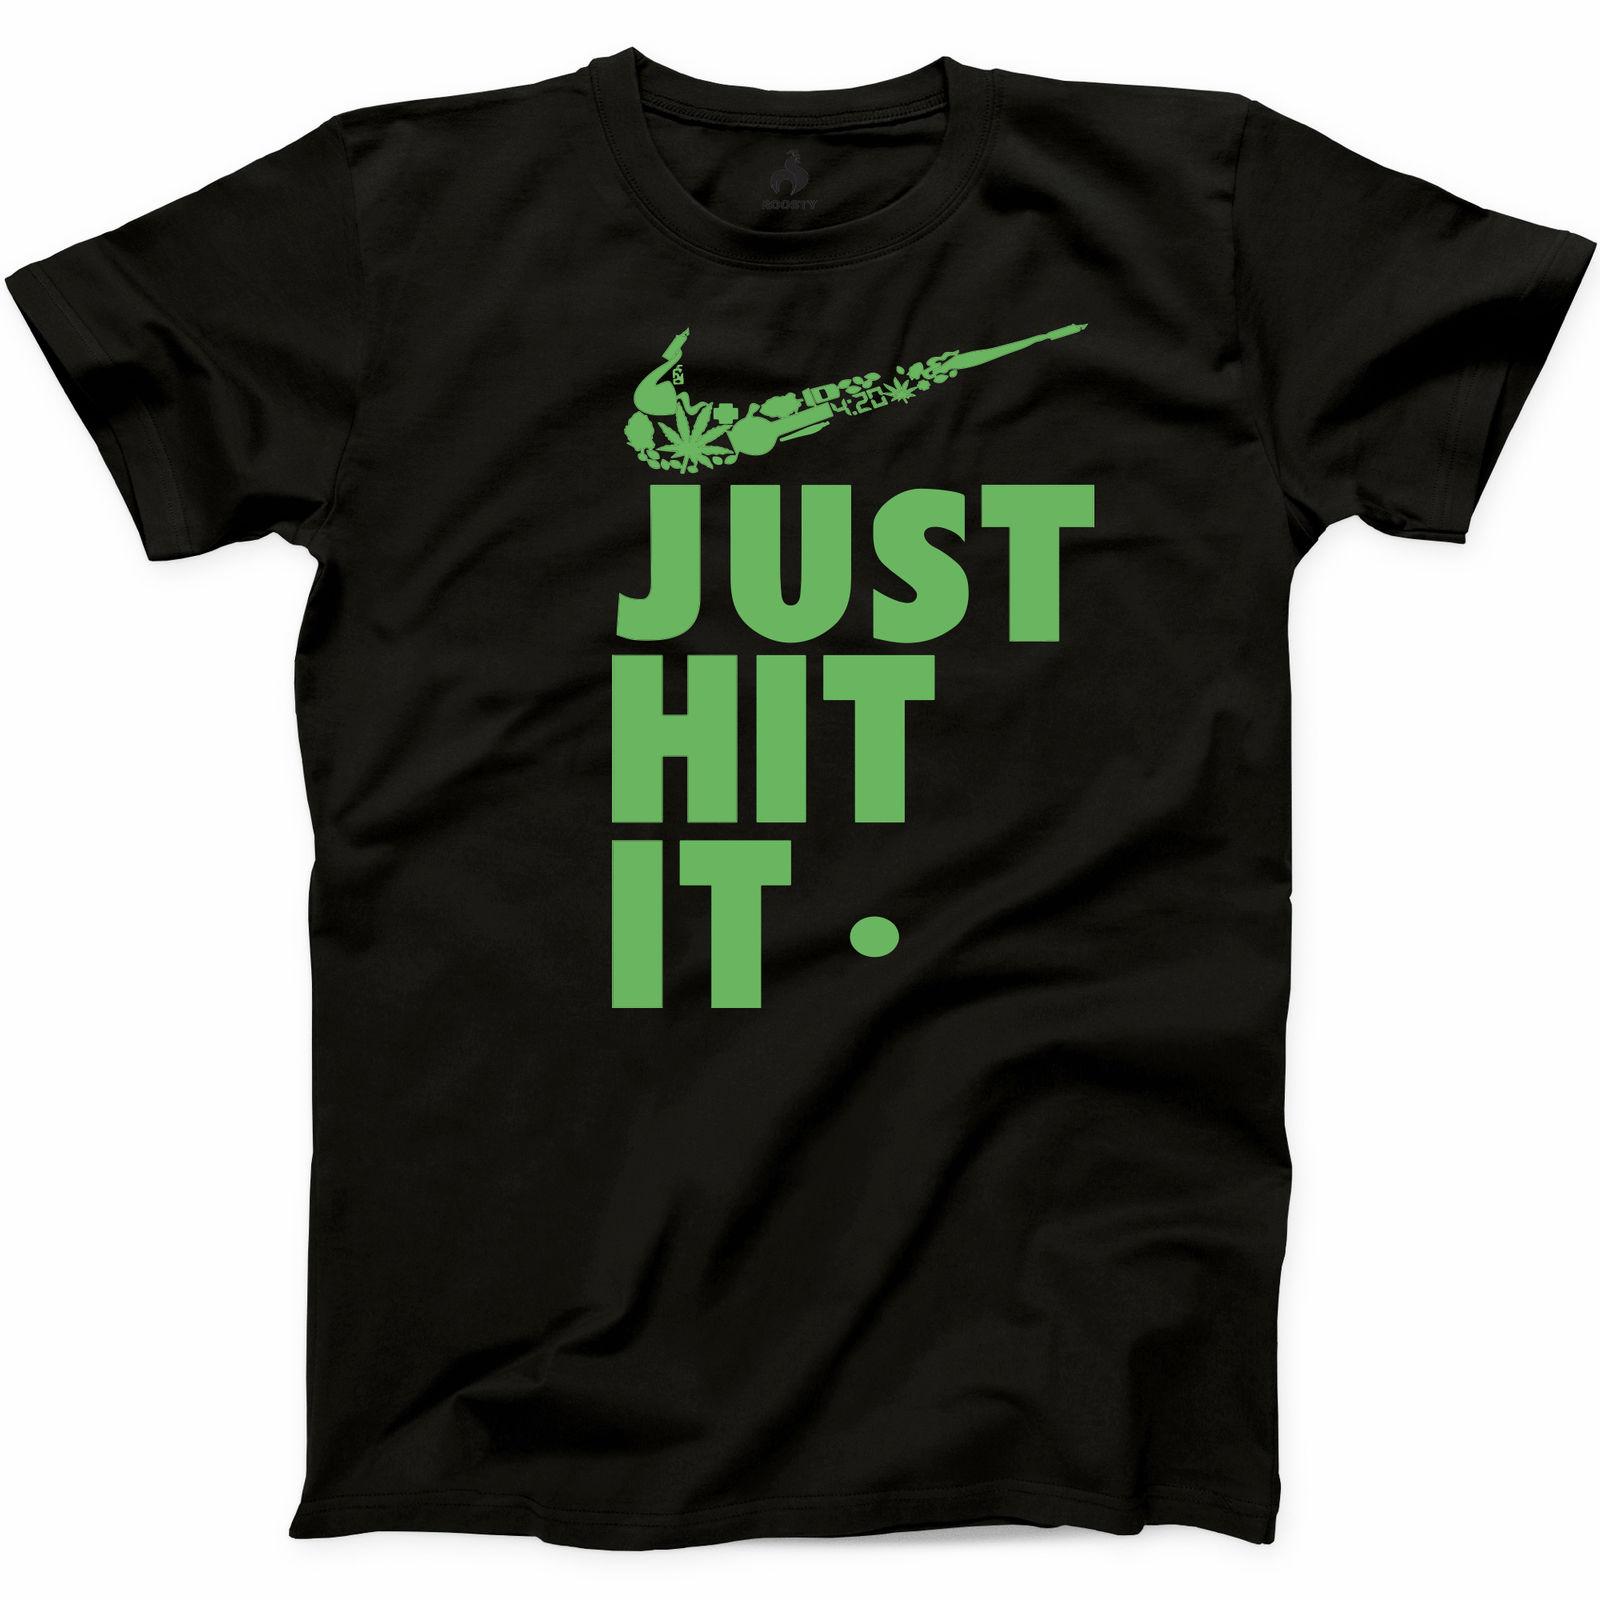 Just Hit It T Shirt Funny Weed Natural Marijuana Kush Joint Graphic Tee S-3XL 1